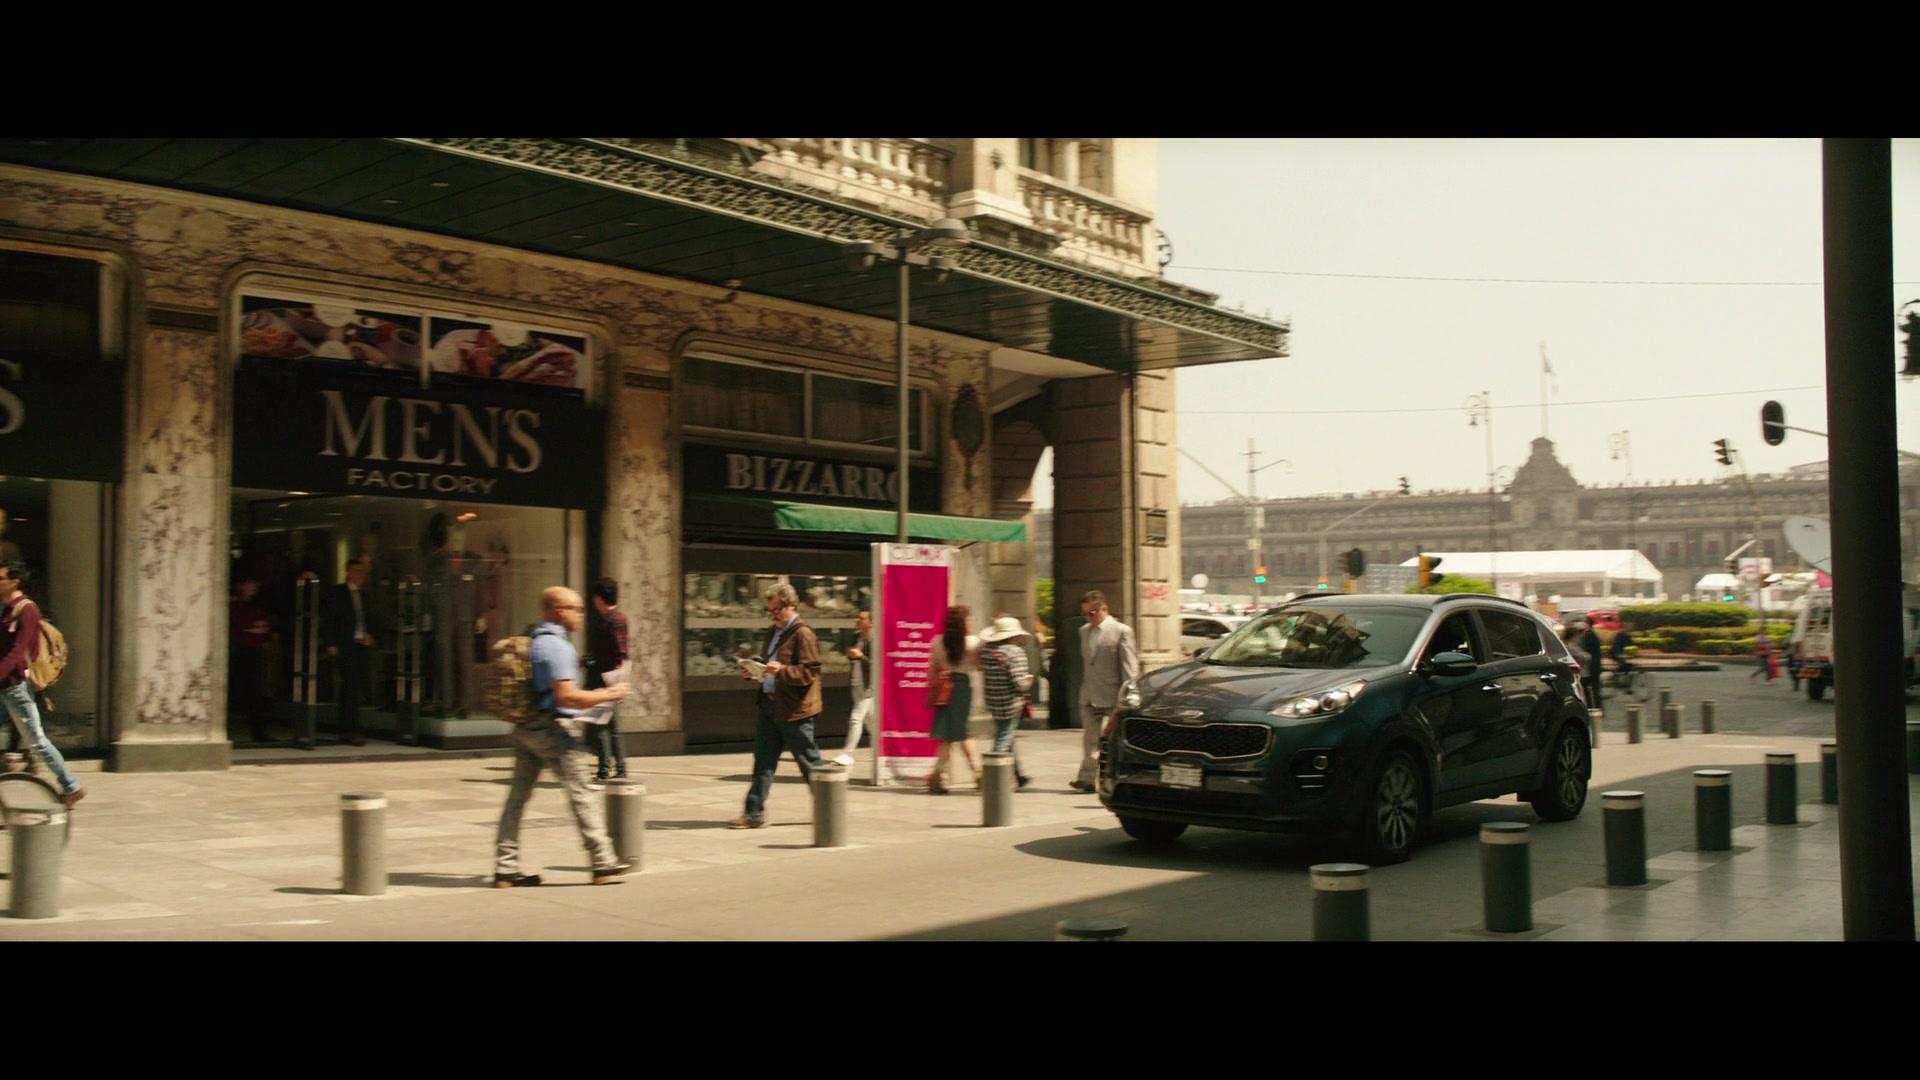 Kia Car In The Romanoffs Season 1 Episode 6 Panorama